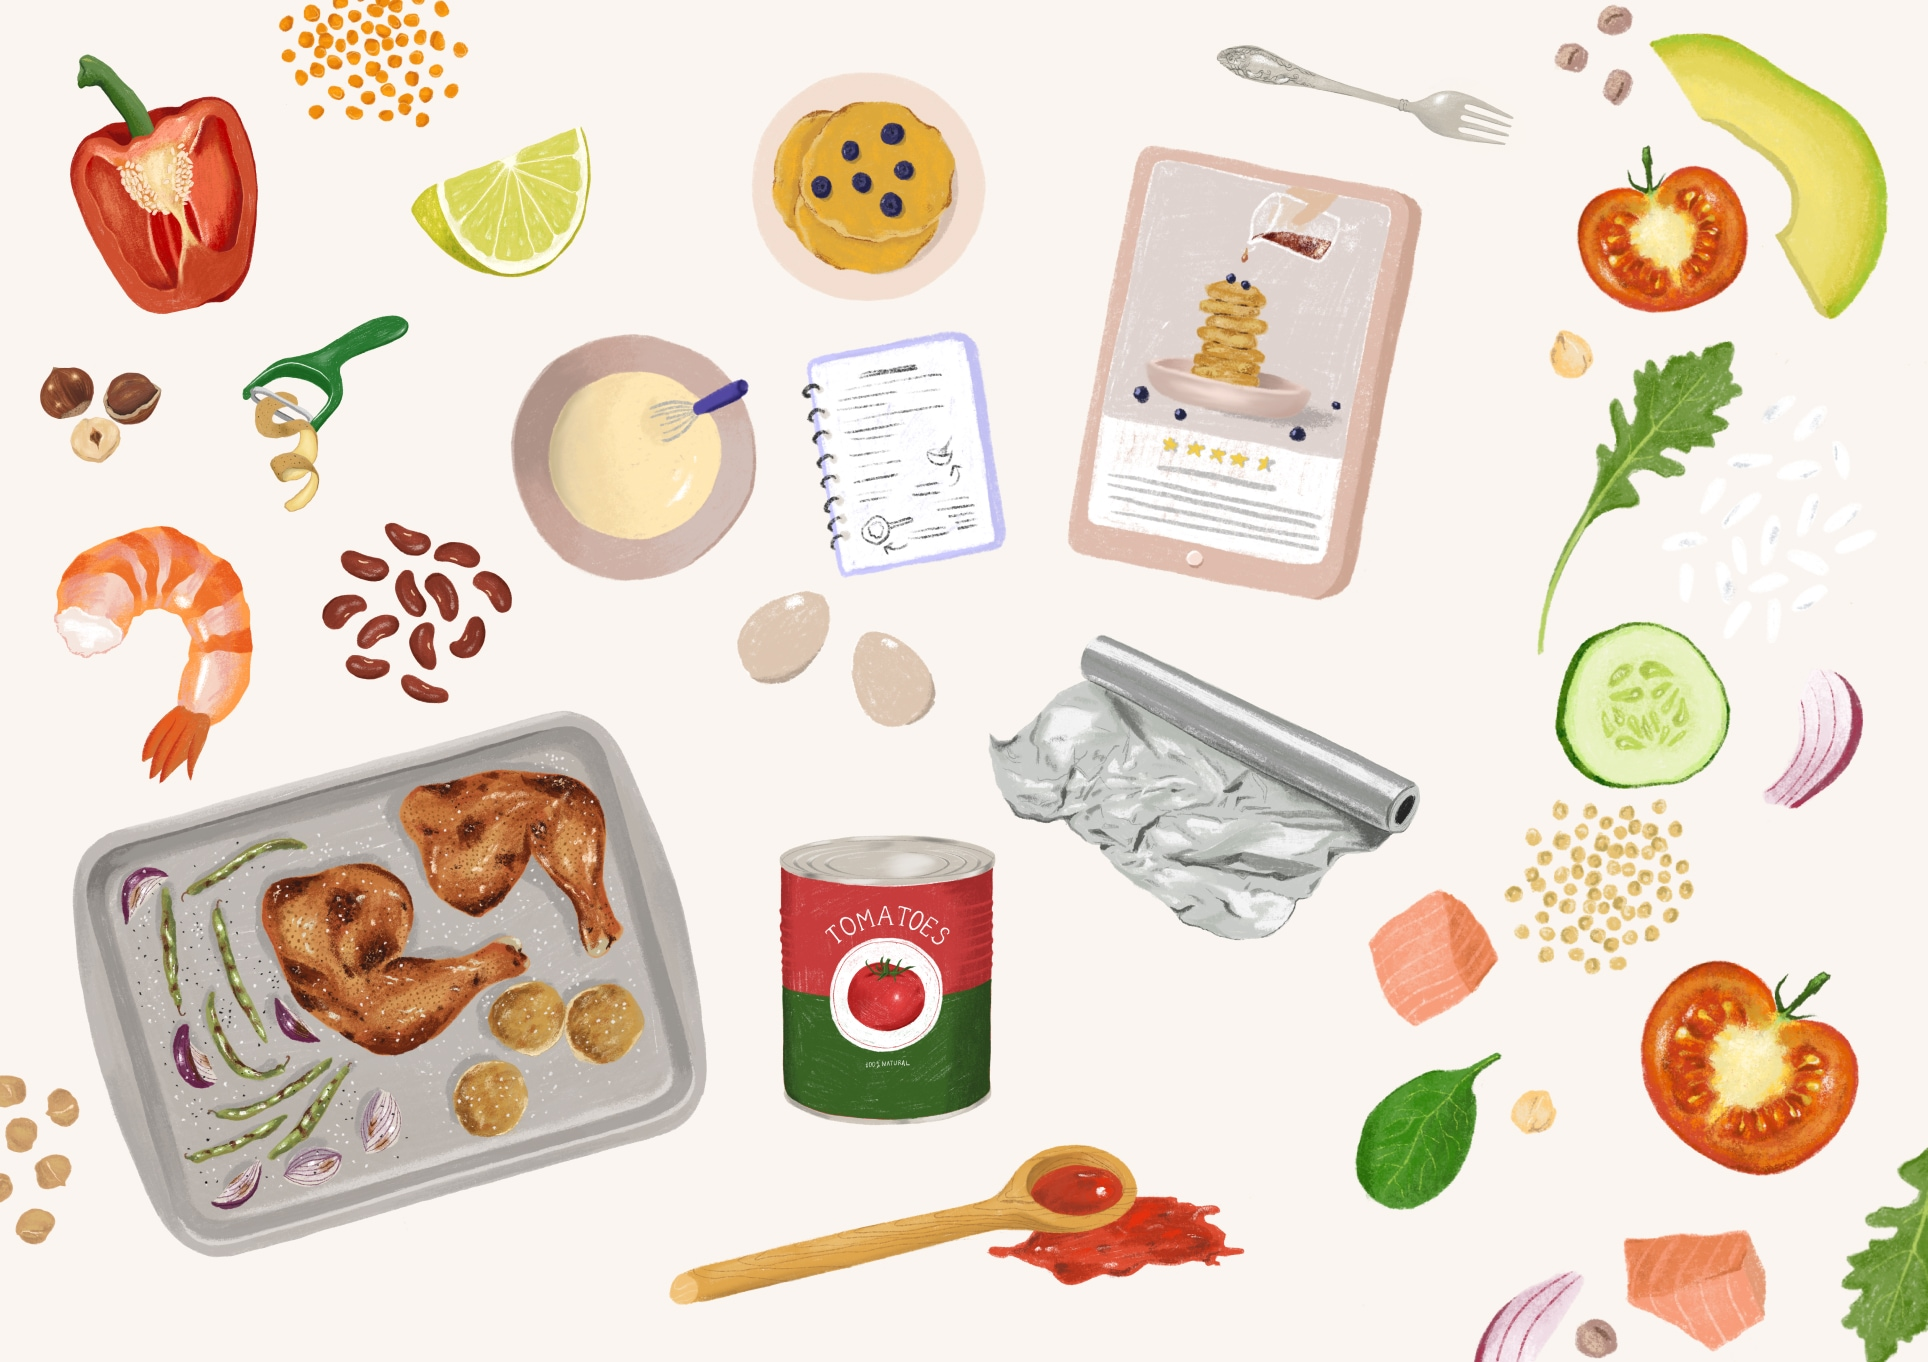 Illustrations from the cookbook by Amina Urkumbayeva